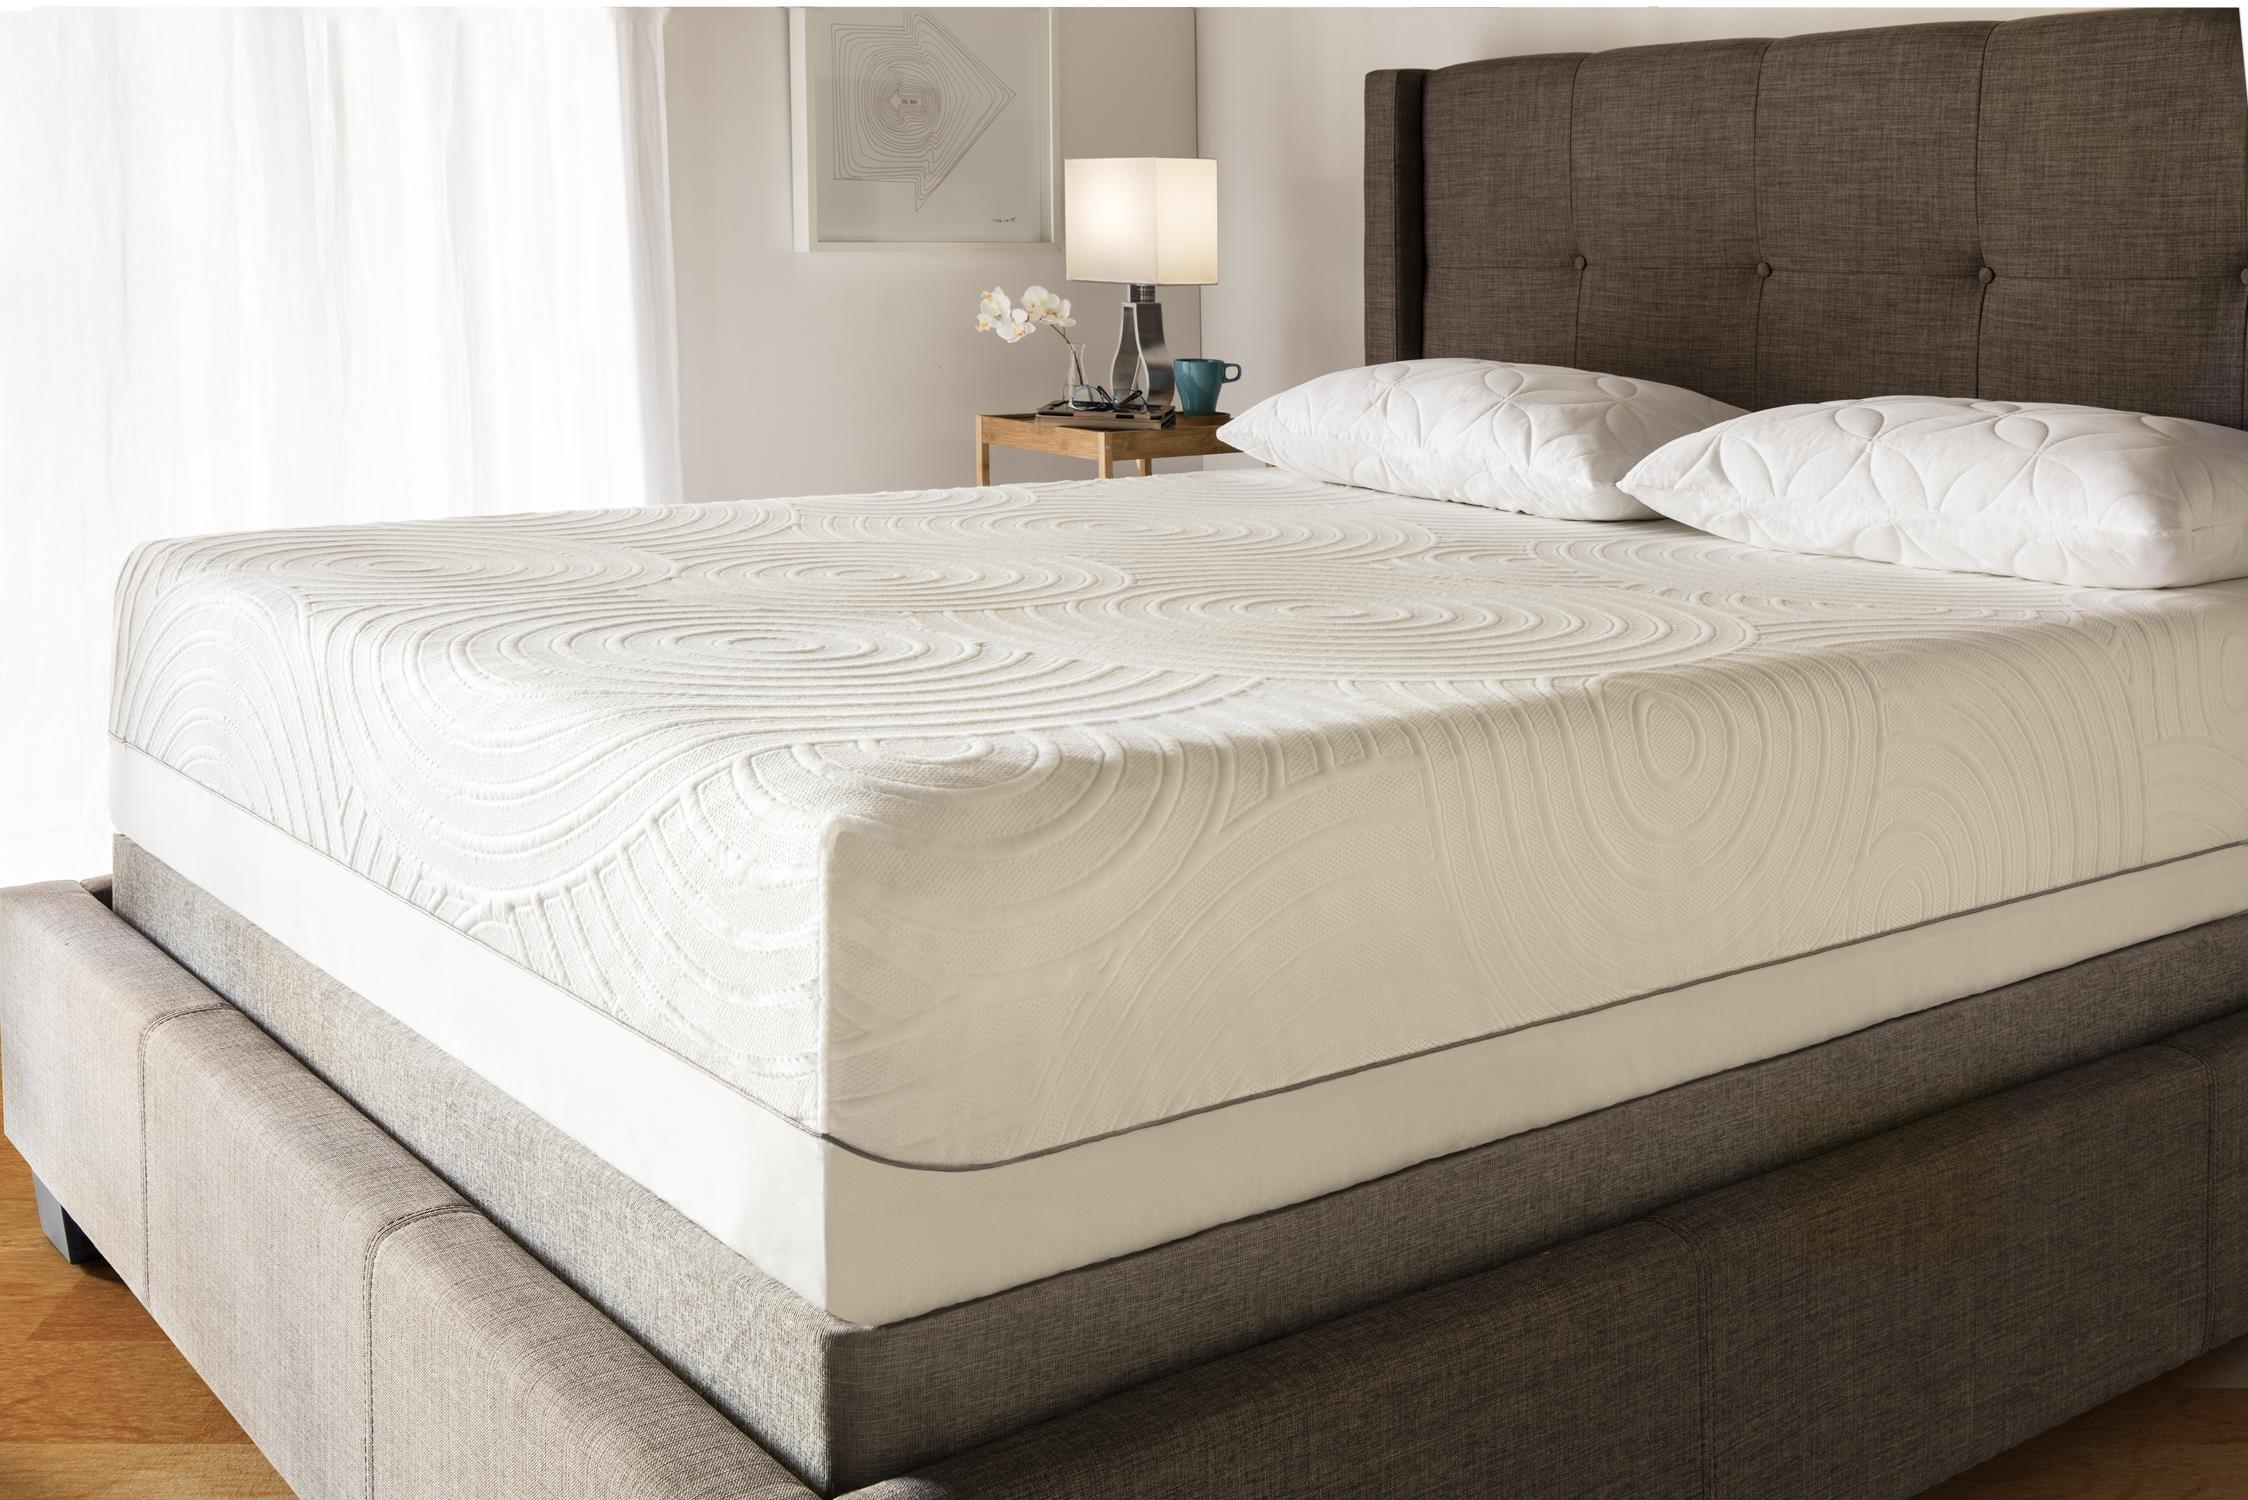 tempur protect split cal king mattress protector